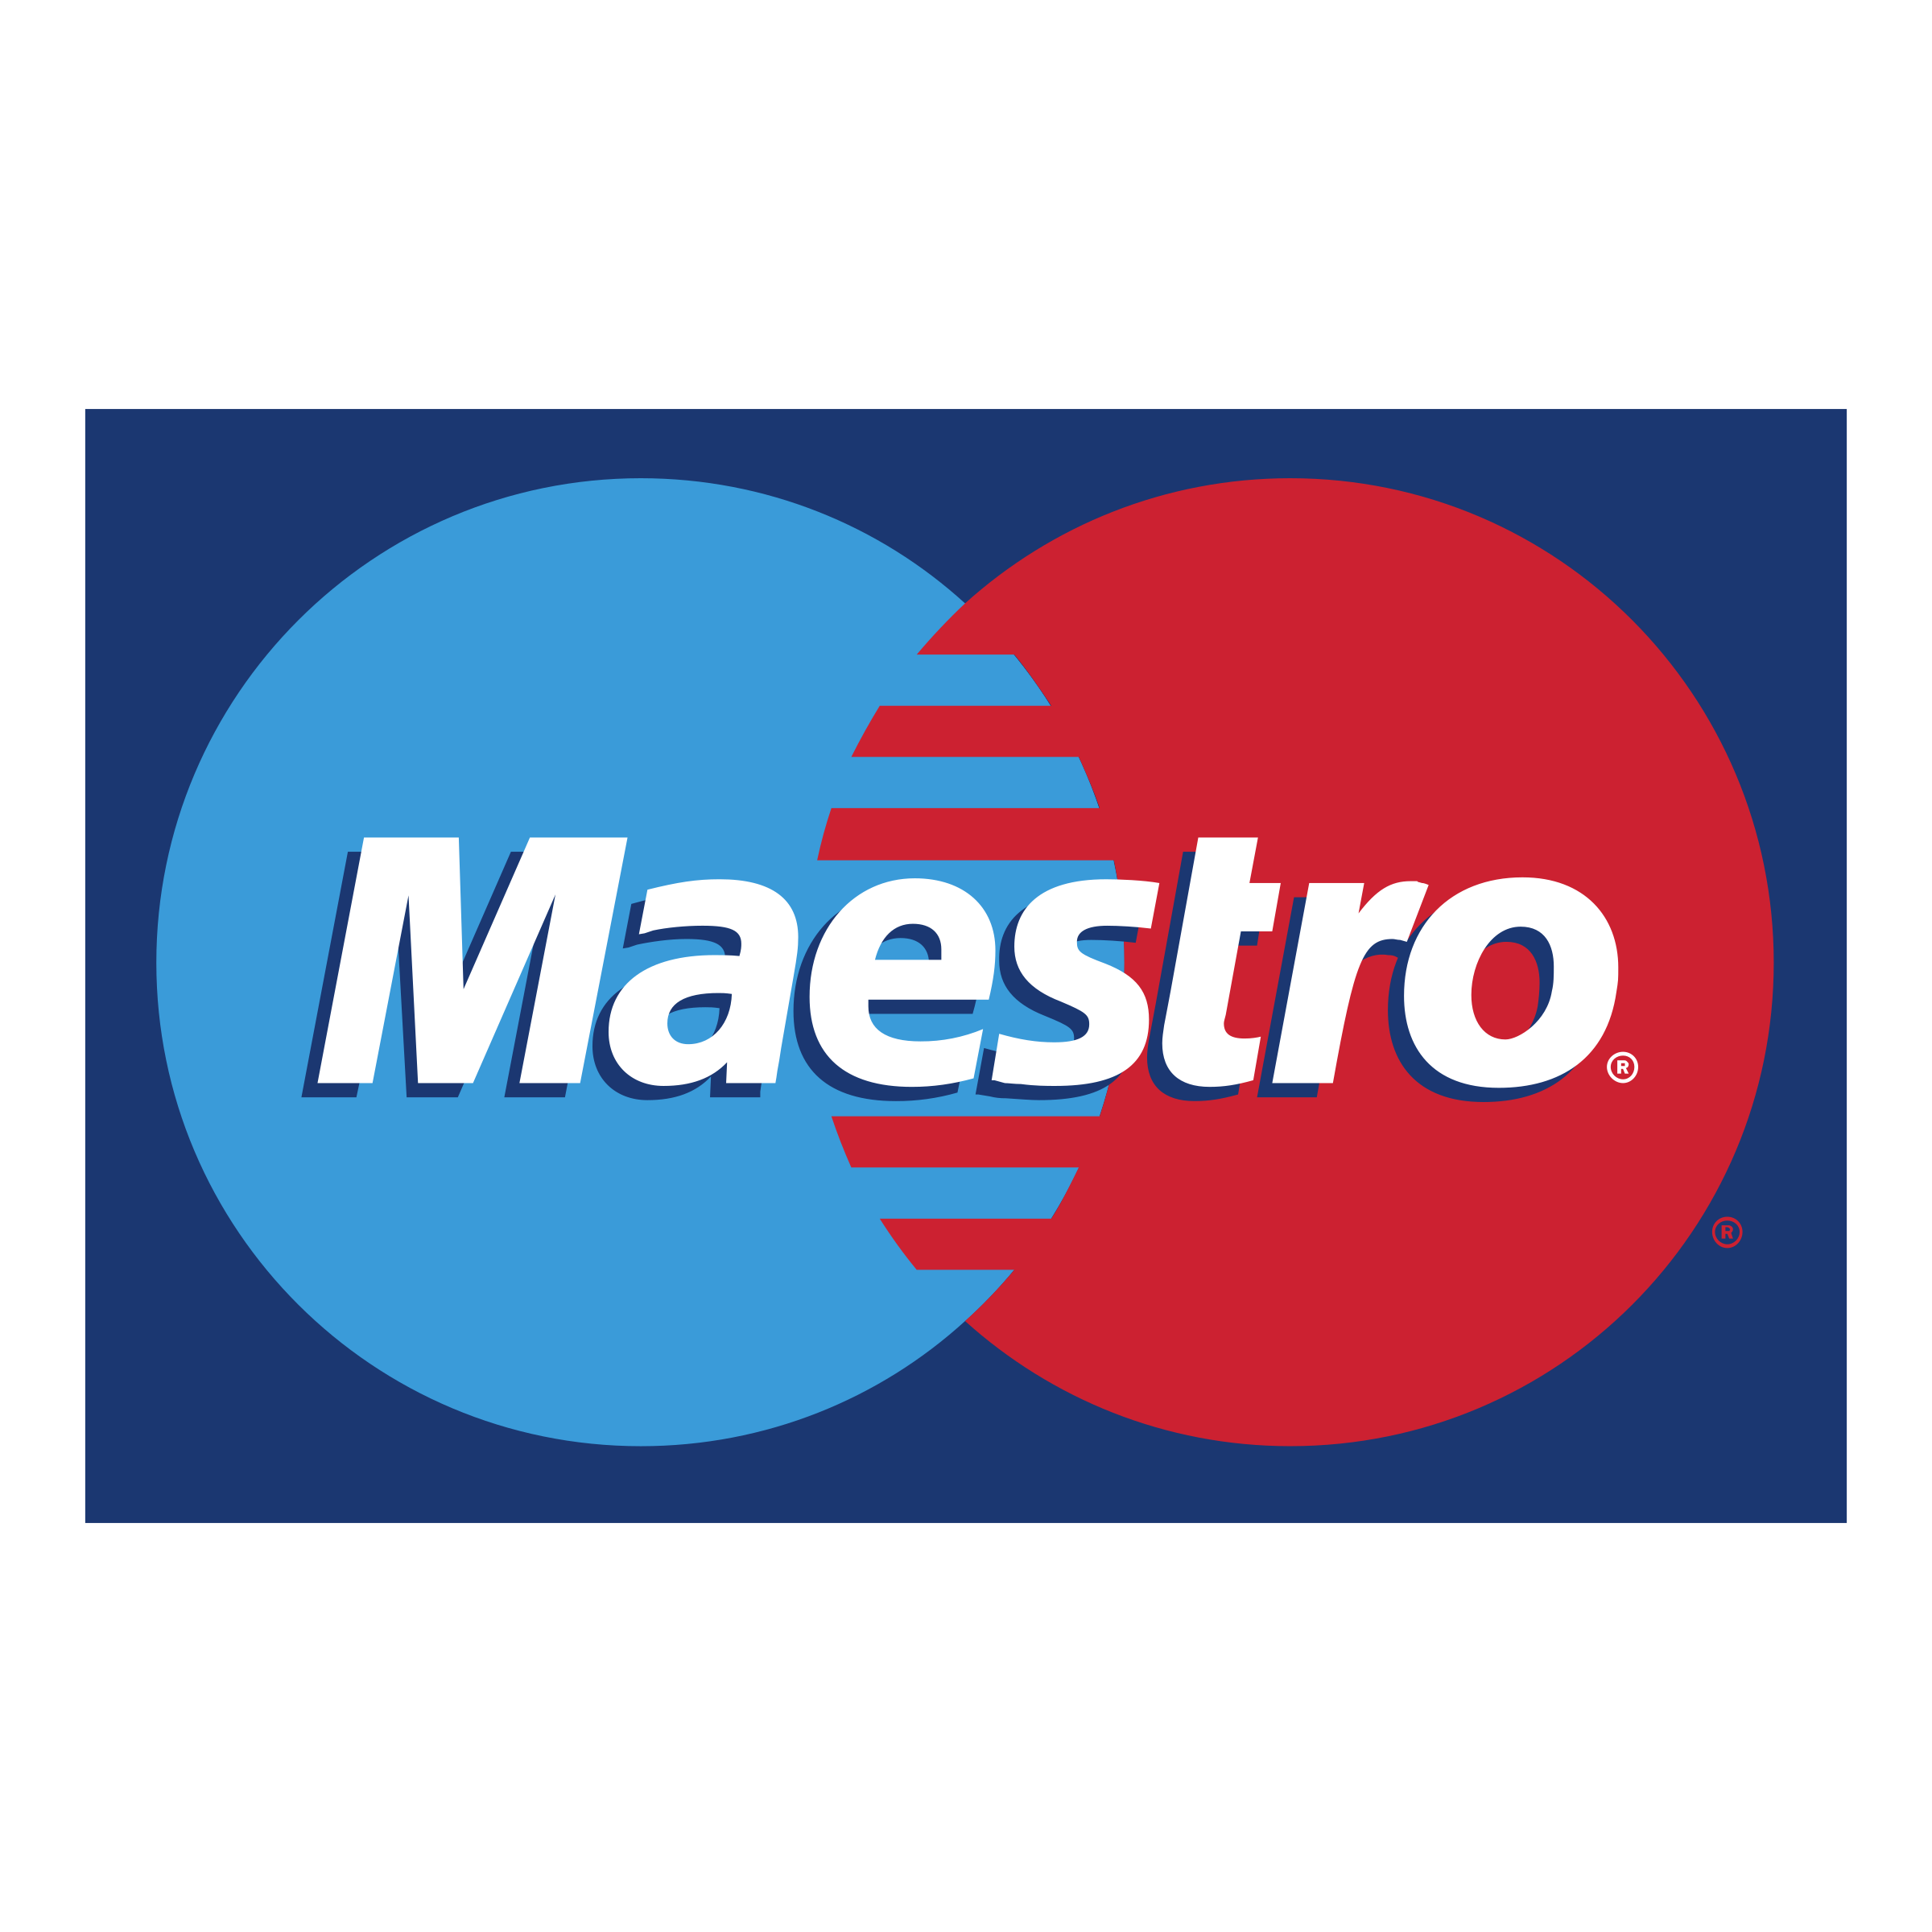 Maestro Logo PNG Transparent & SVG Vector - Freebie Supply